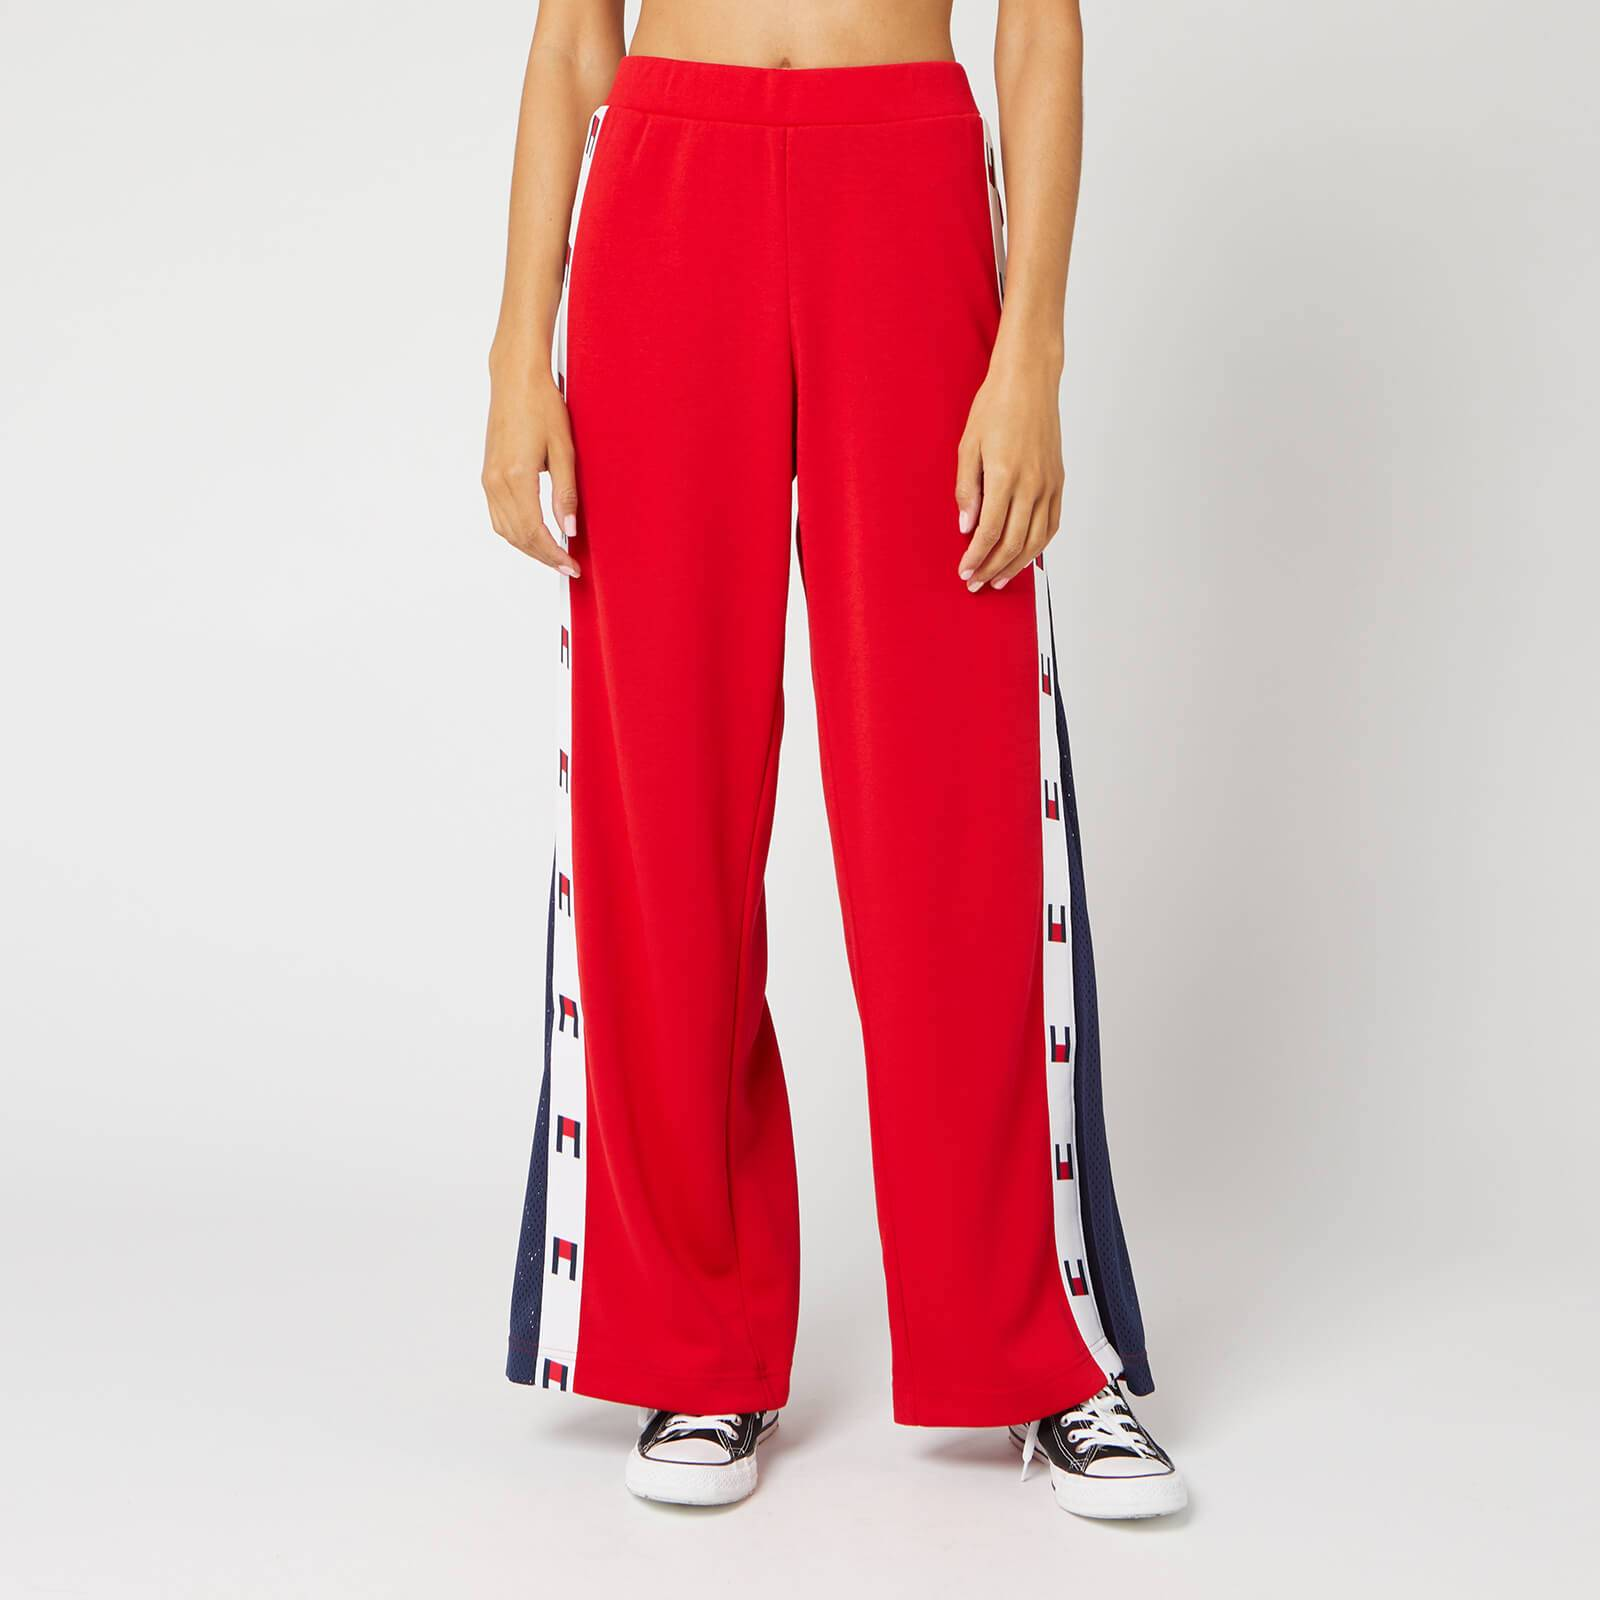 Tommy Sport Women's Flag Tape Flare Pants - True Red - M